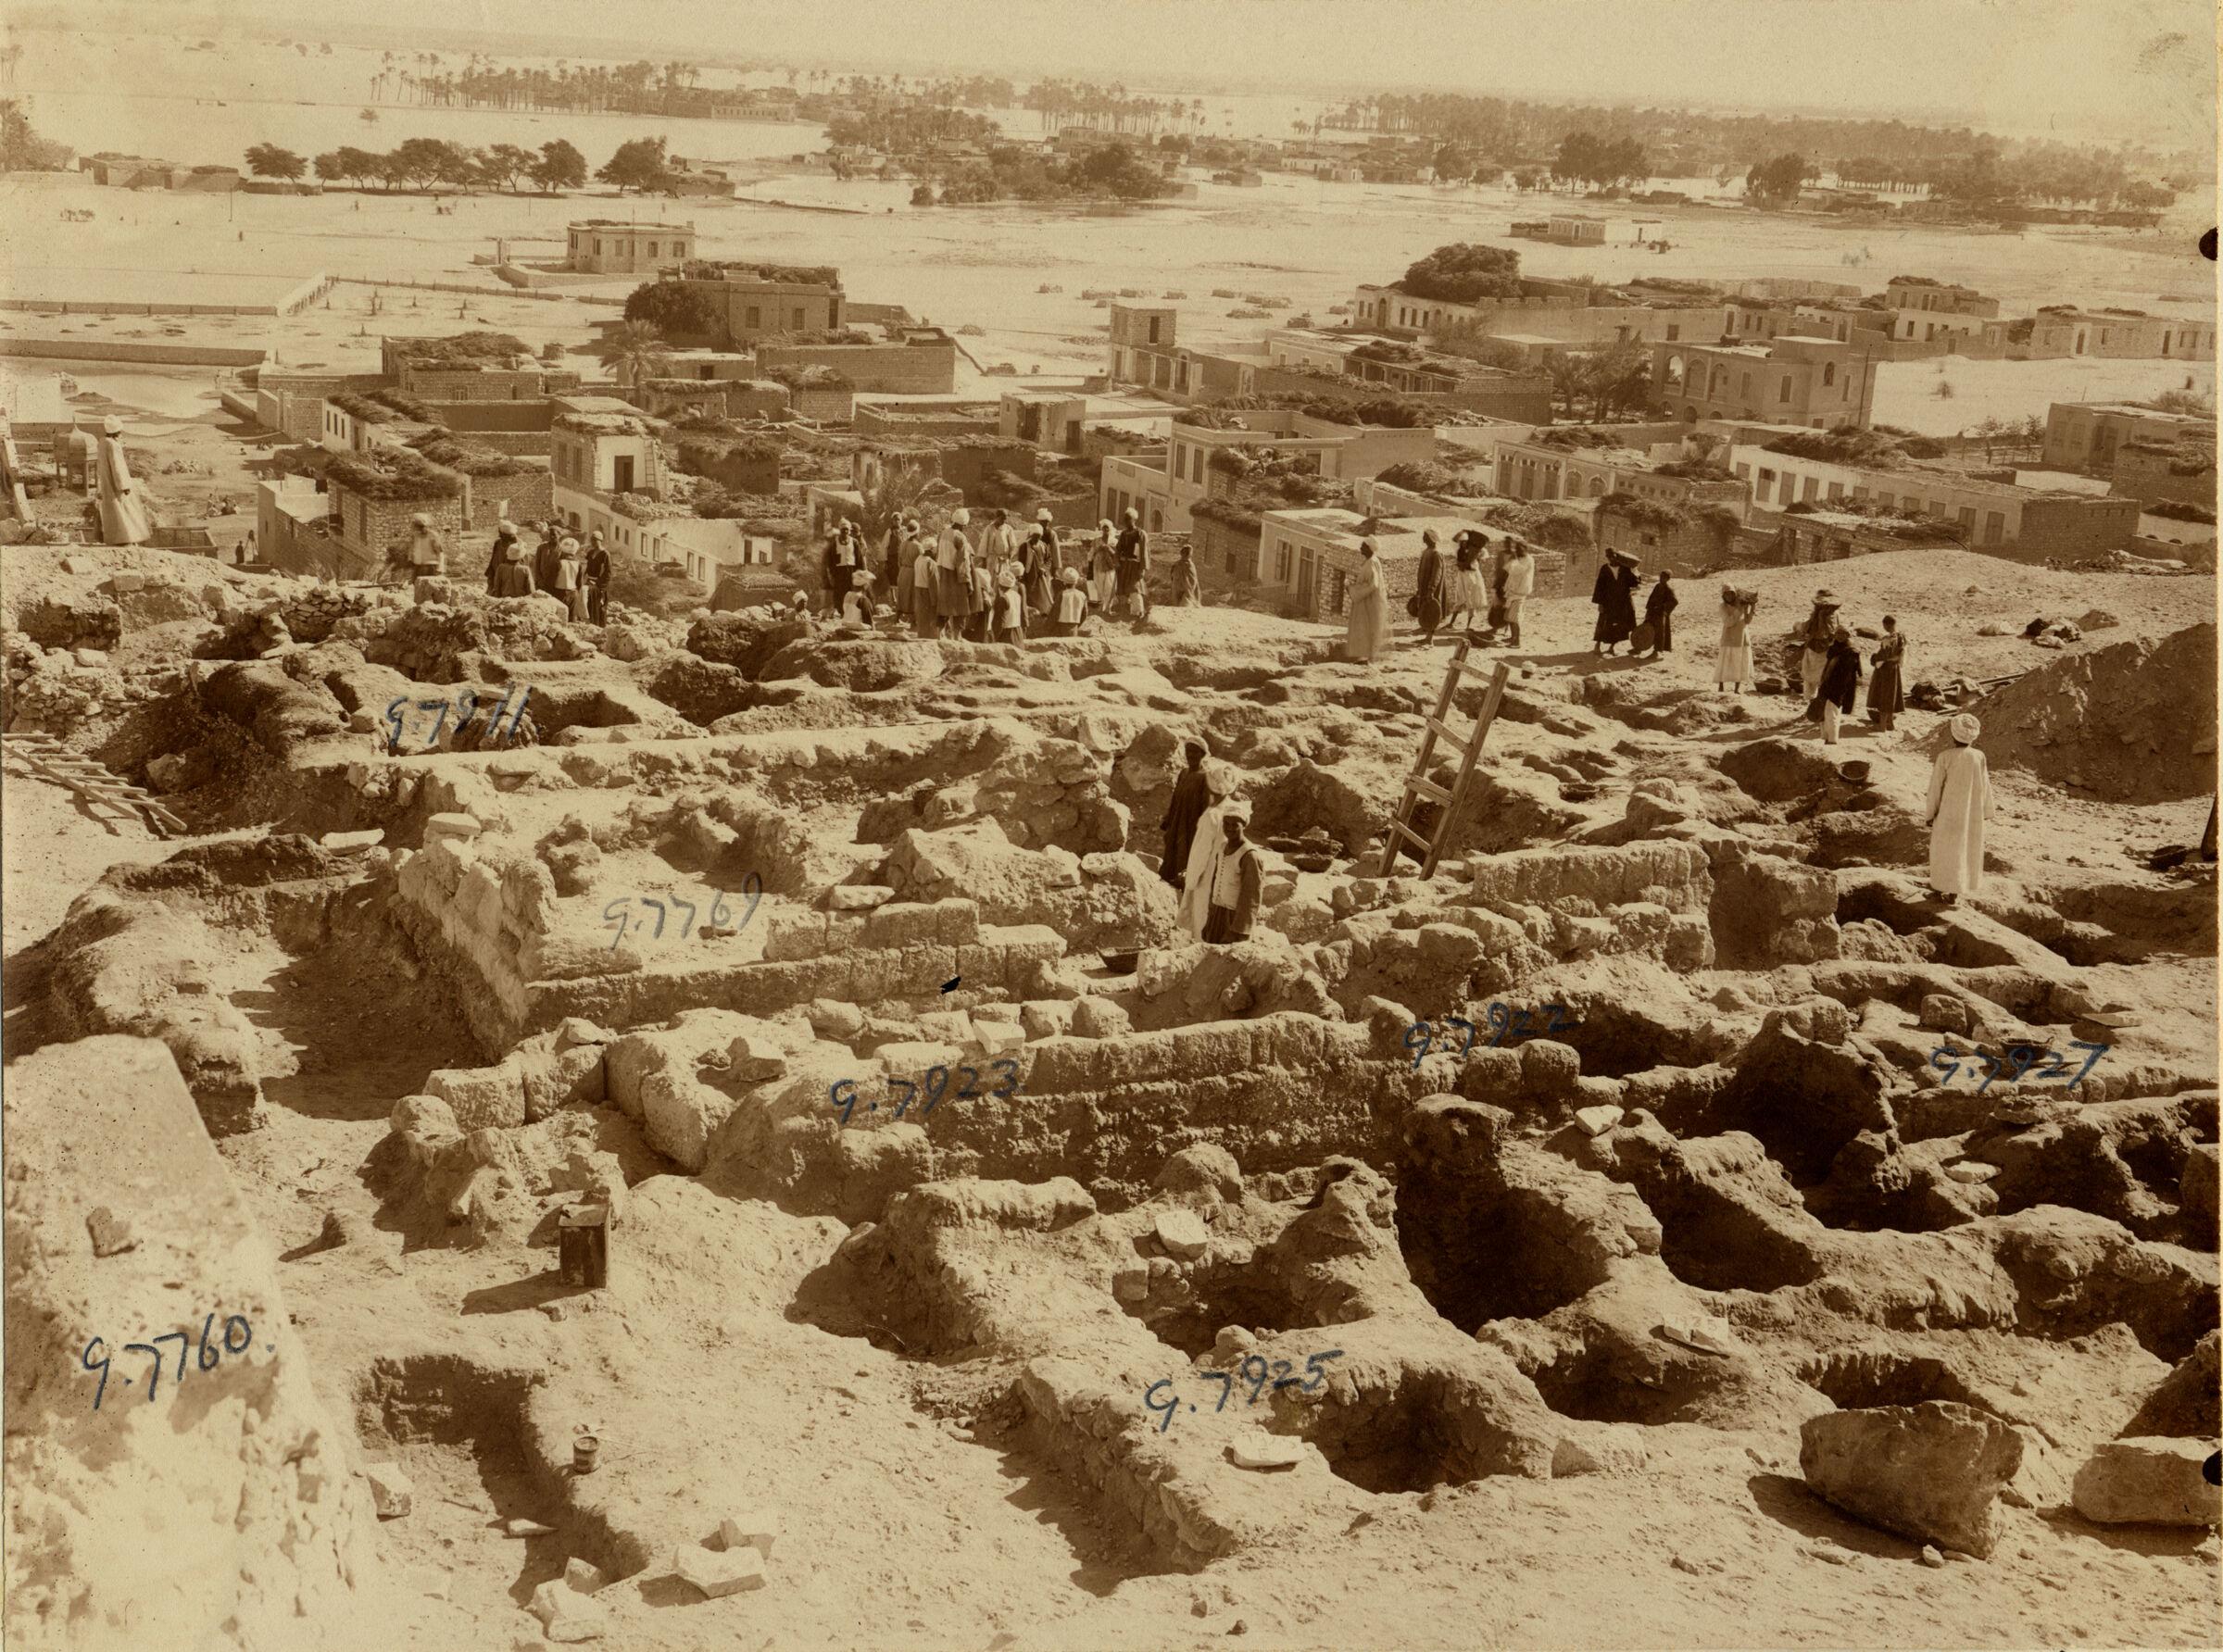 Eastern Cemetery: Site: Giza; View: G 7760, G 7925, G 7923, G 7922, G 7927, G 7769, G 7911